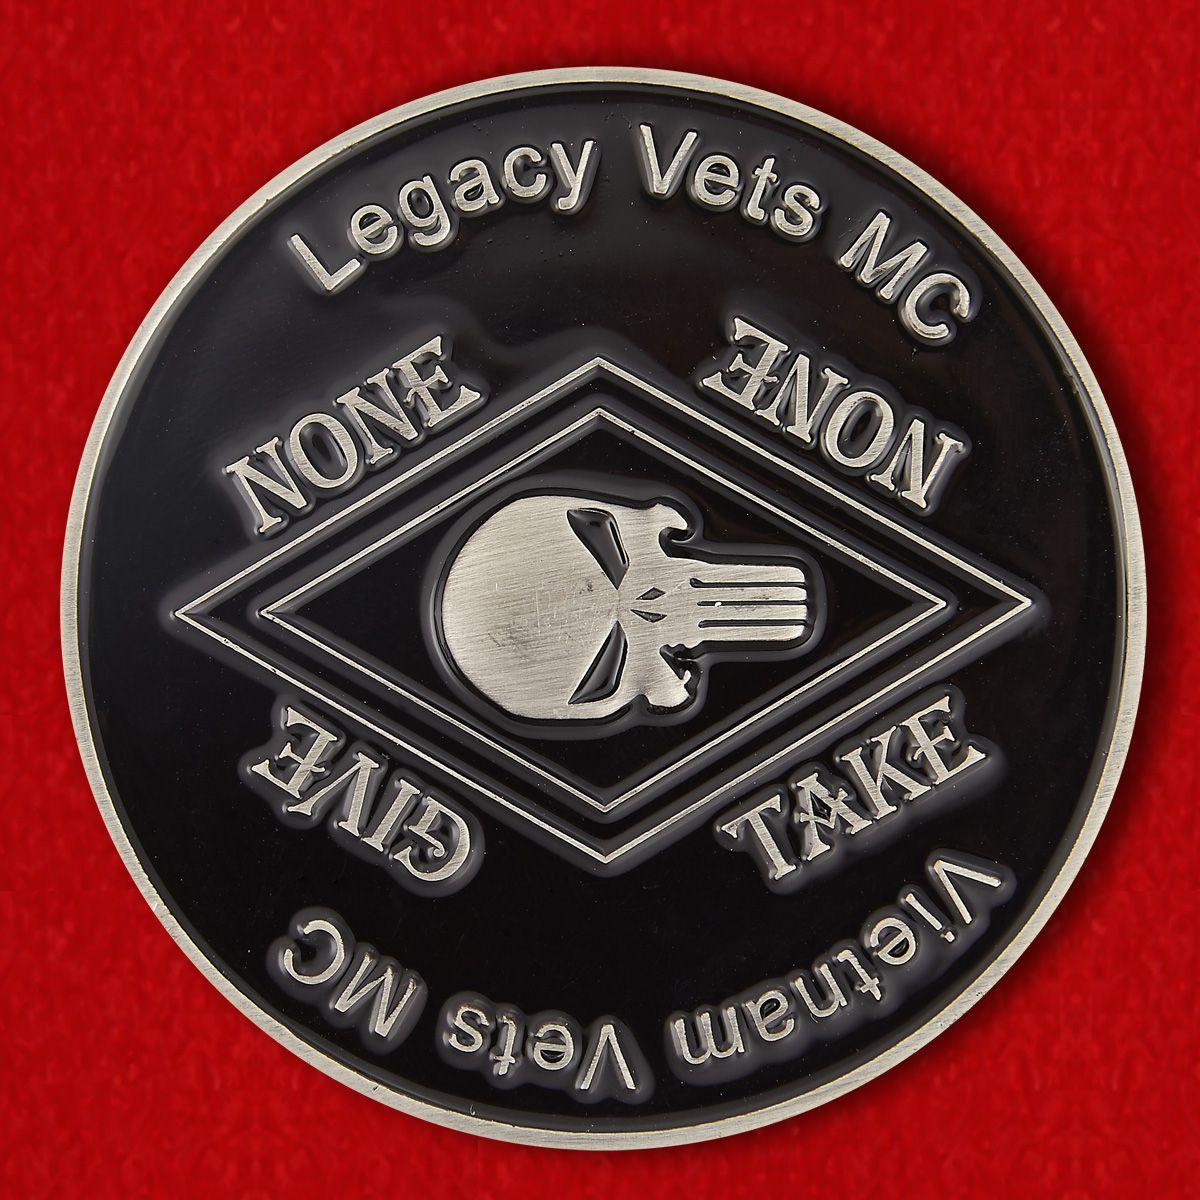 Челлендж коин мотоклуба ветеранов Вьетнама